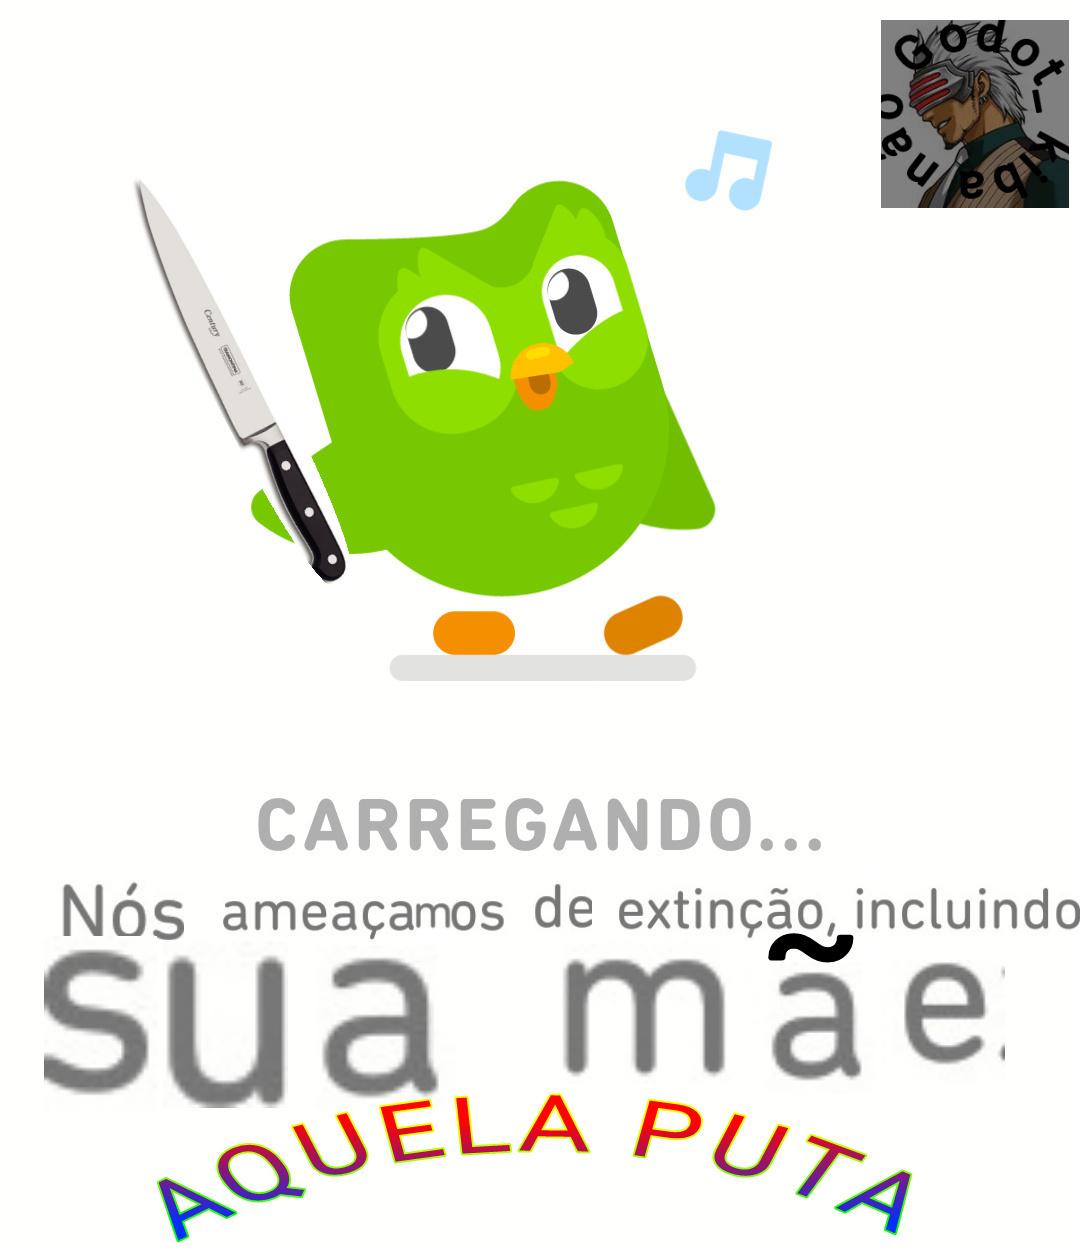 Duolingo psicopata - meme